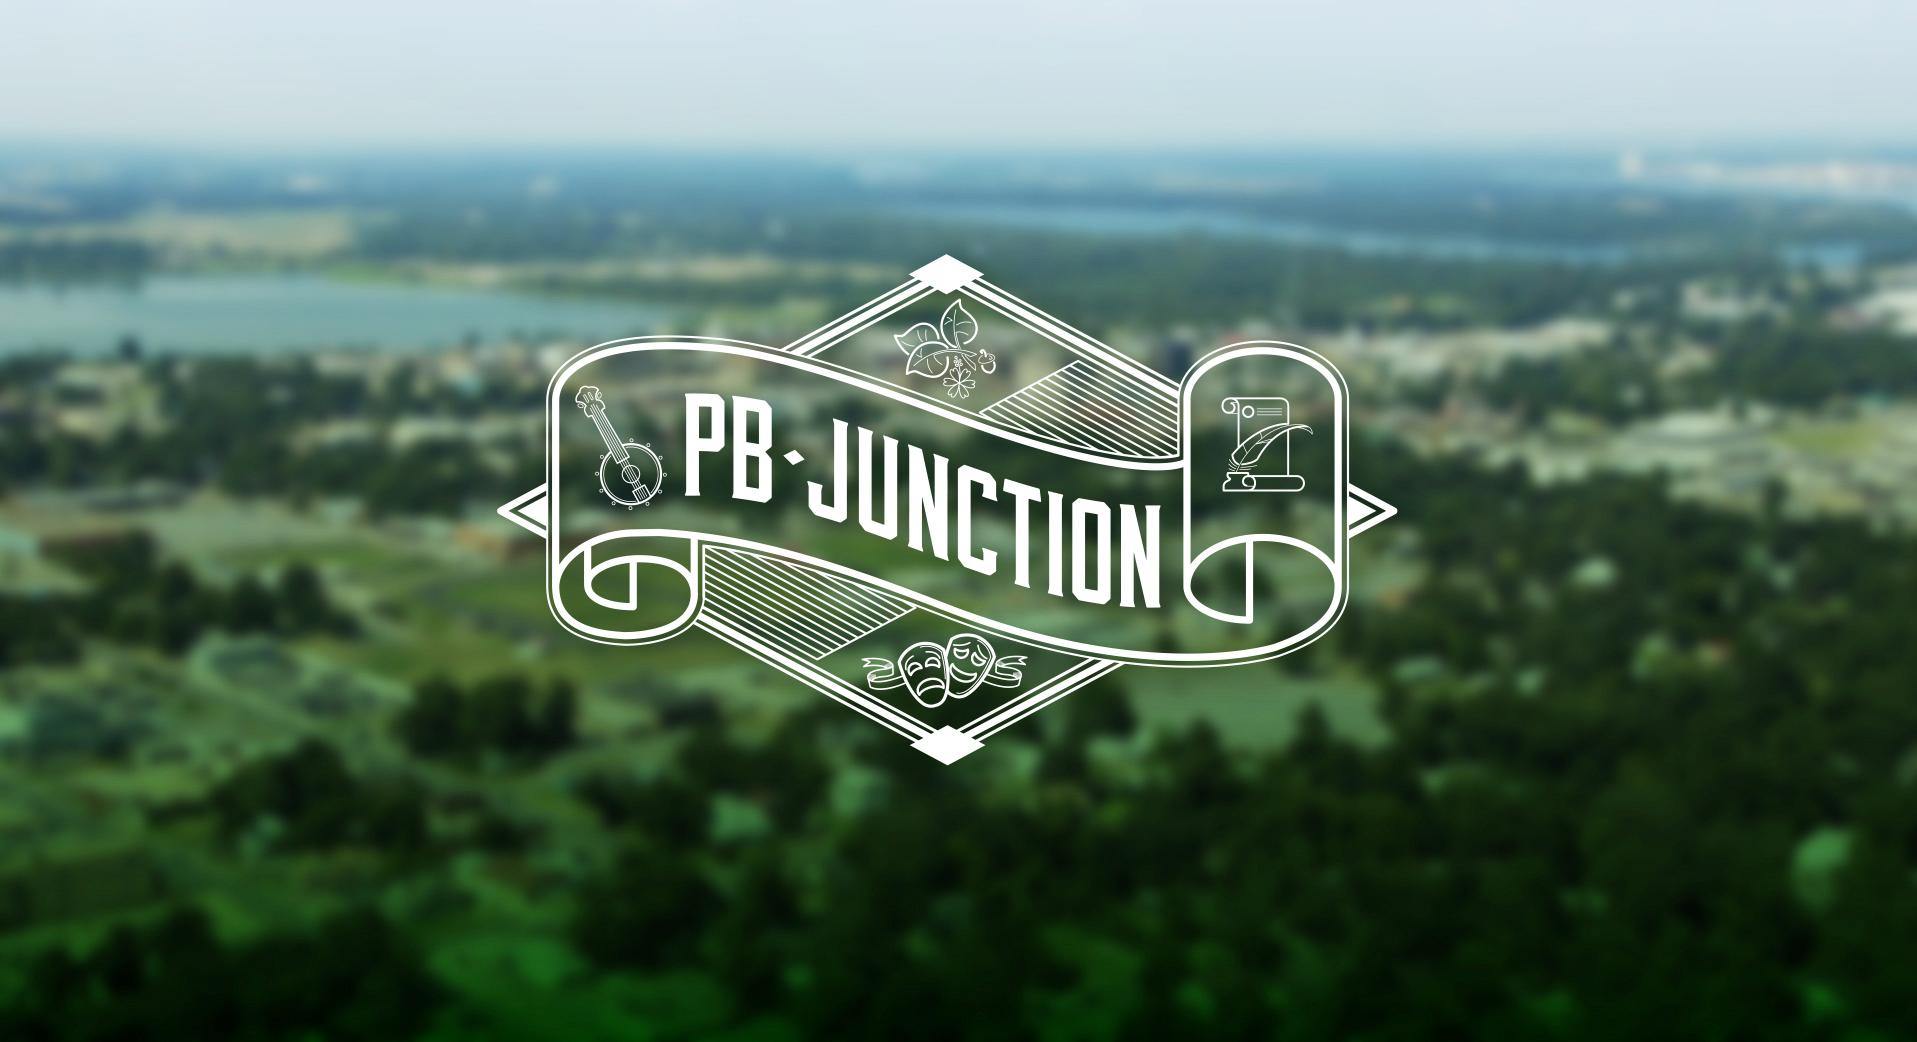 PB Junction